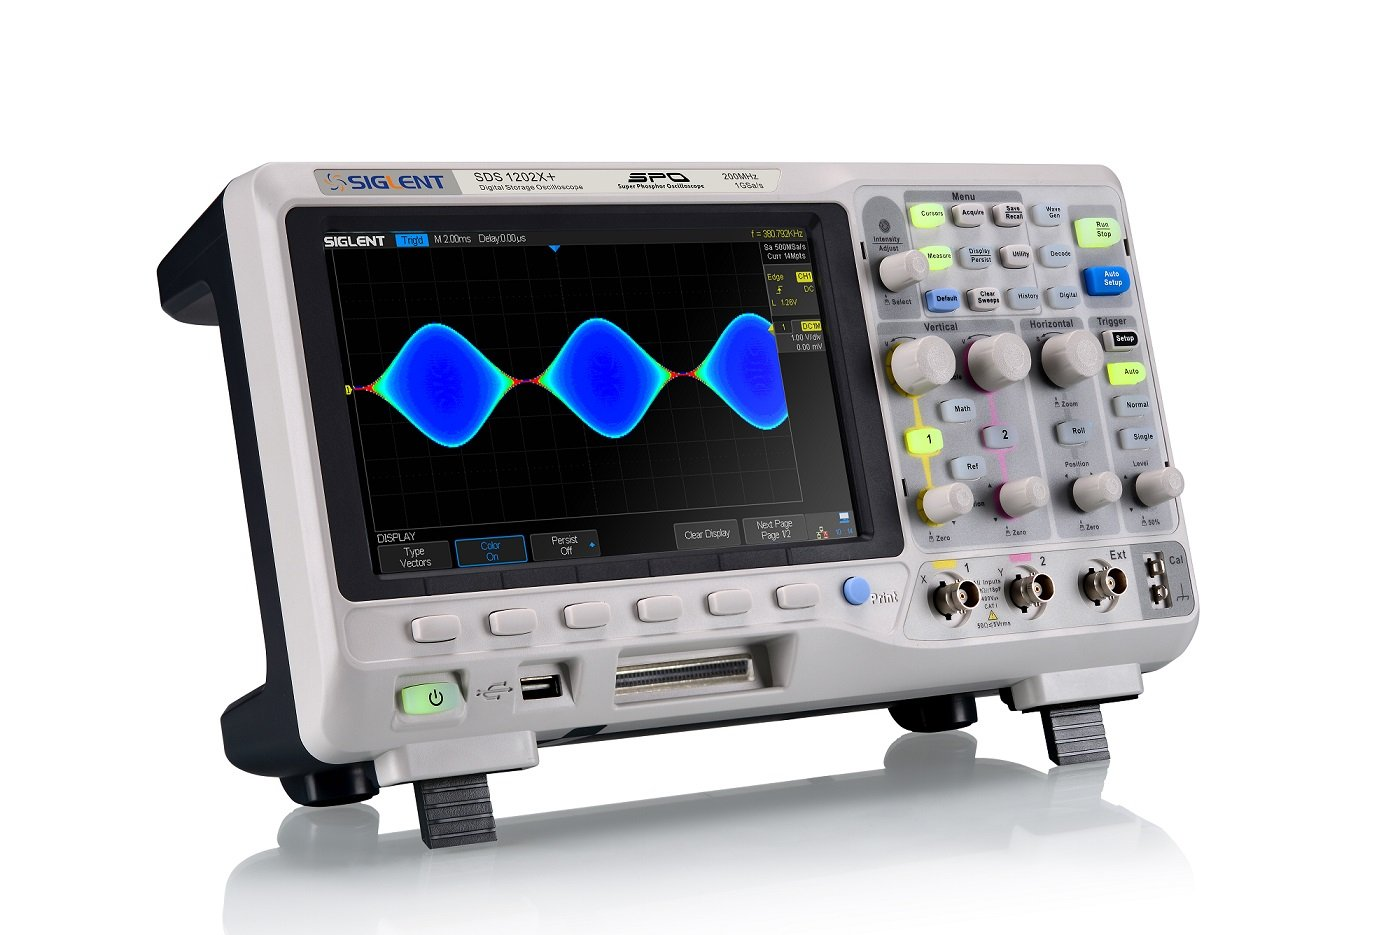 Siglent Technologies SDS1202X Digital Storage Oscilloscope, 200 MHz